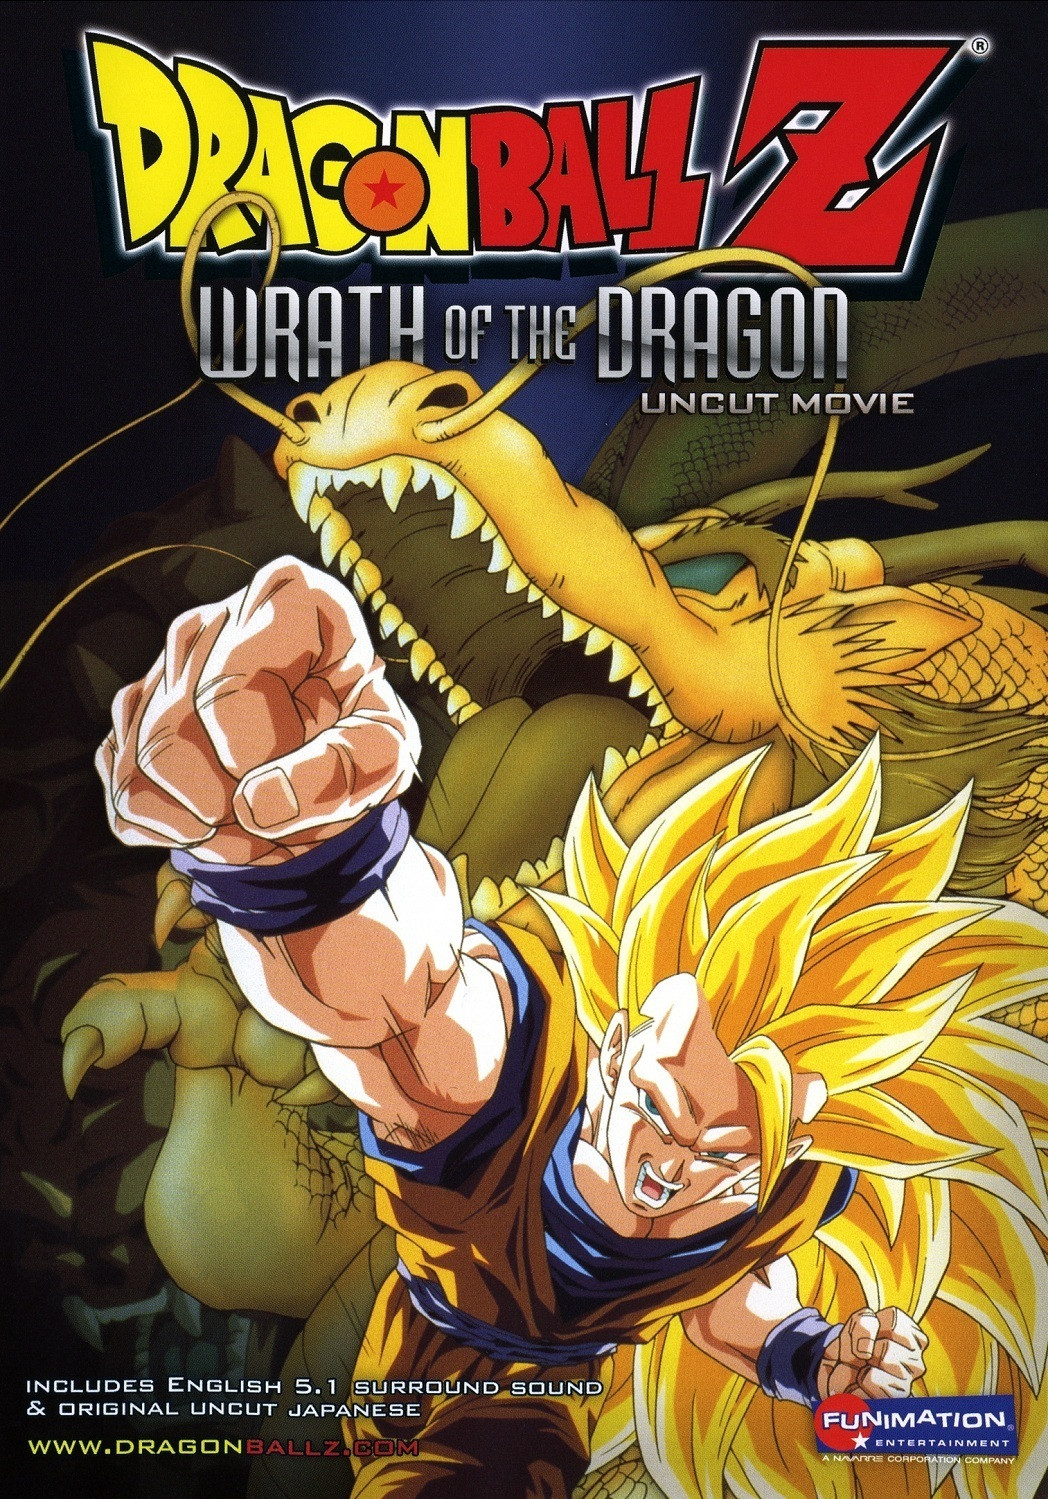 Dragon Ball Z The Movie 13 Explosion of Dragon Punch ฤทธิ์หมัดมังกรถล่มโลก